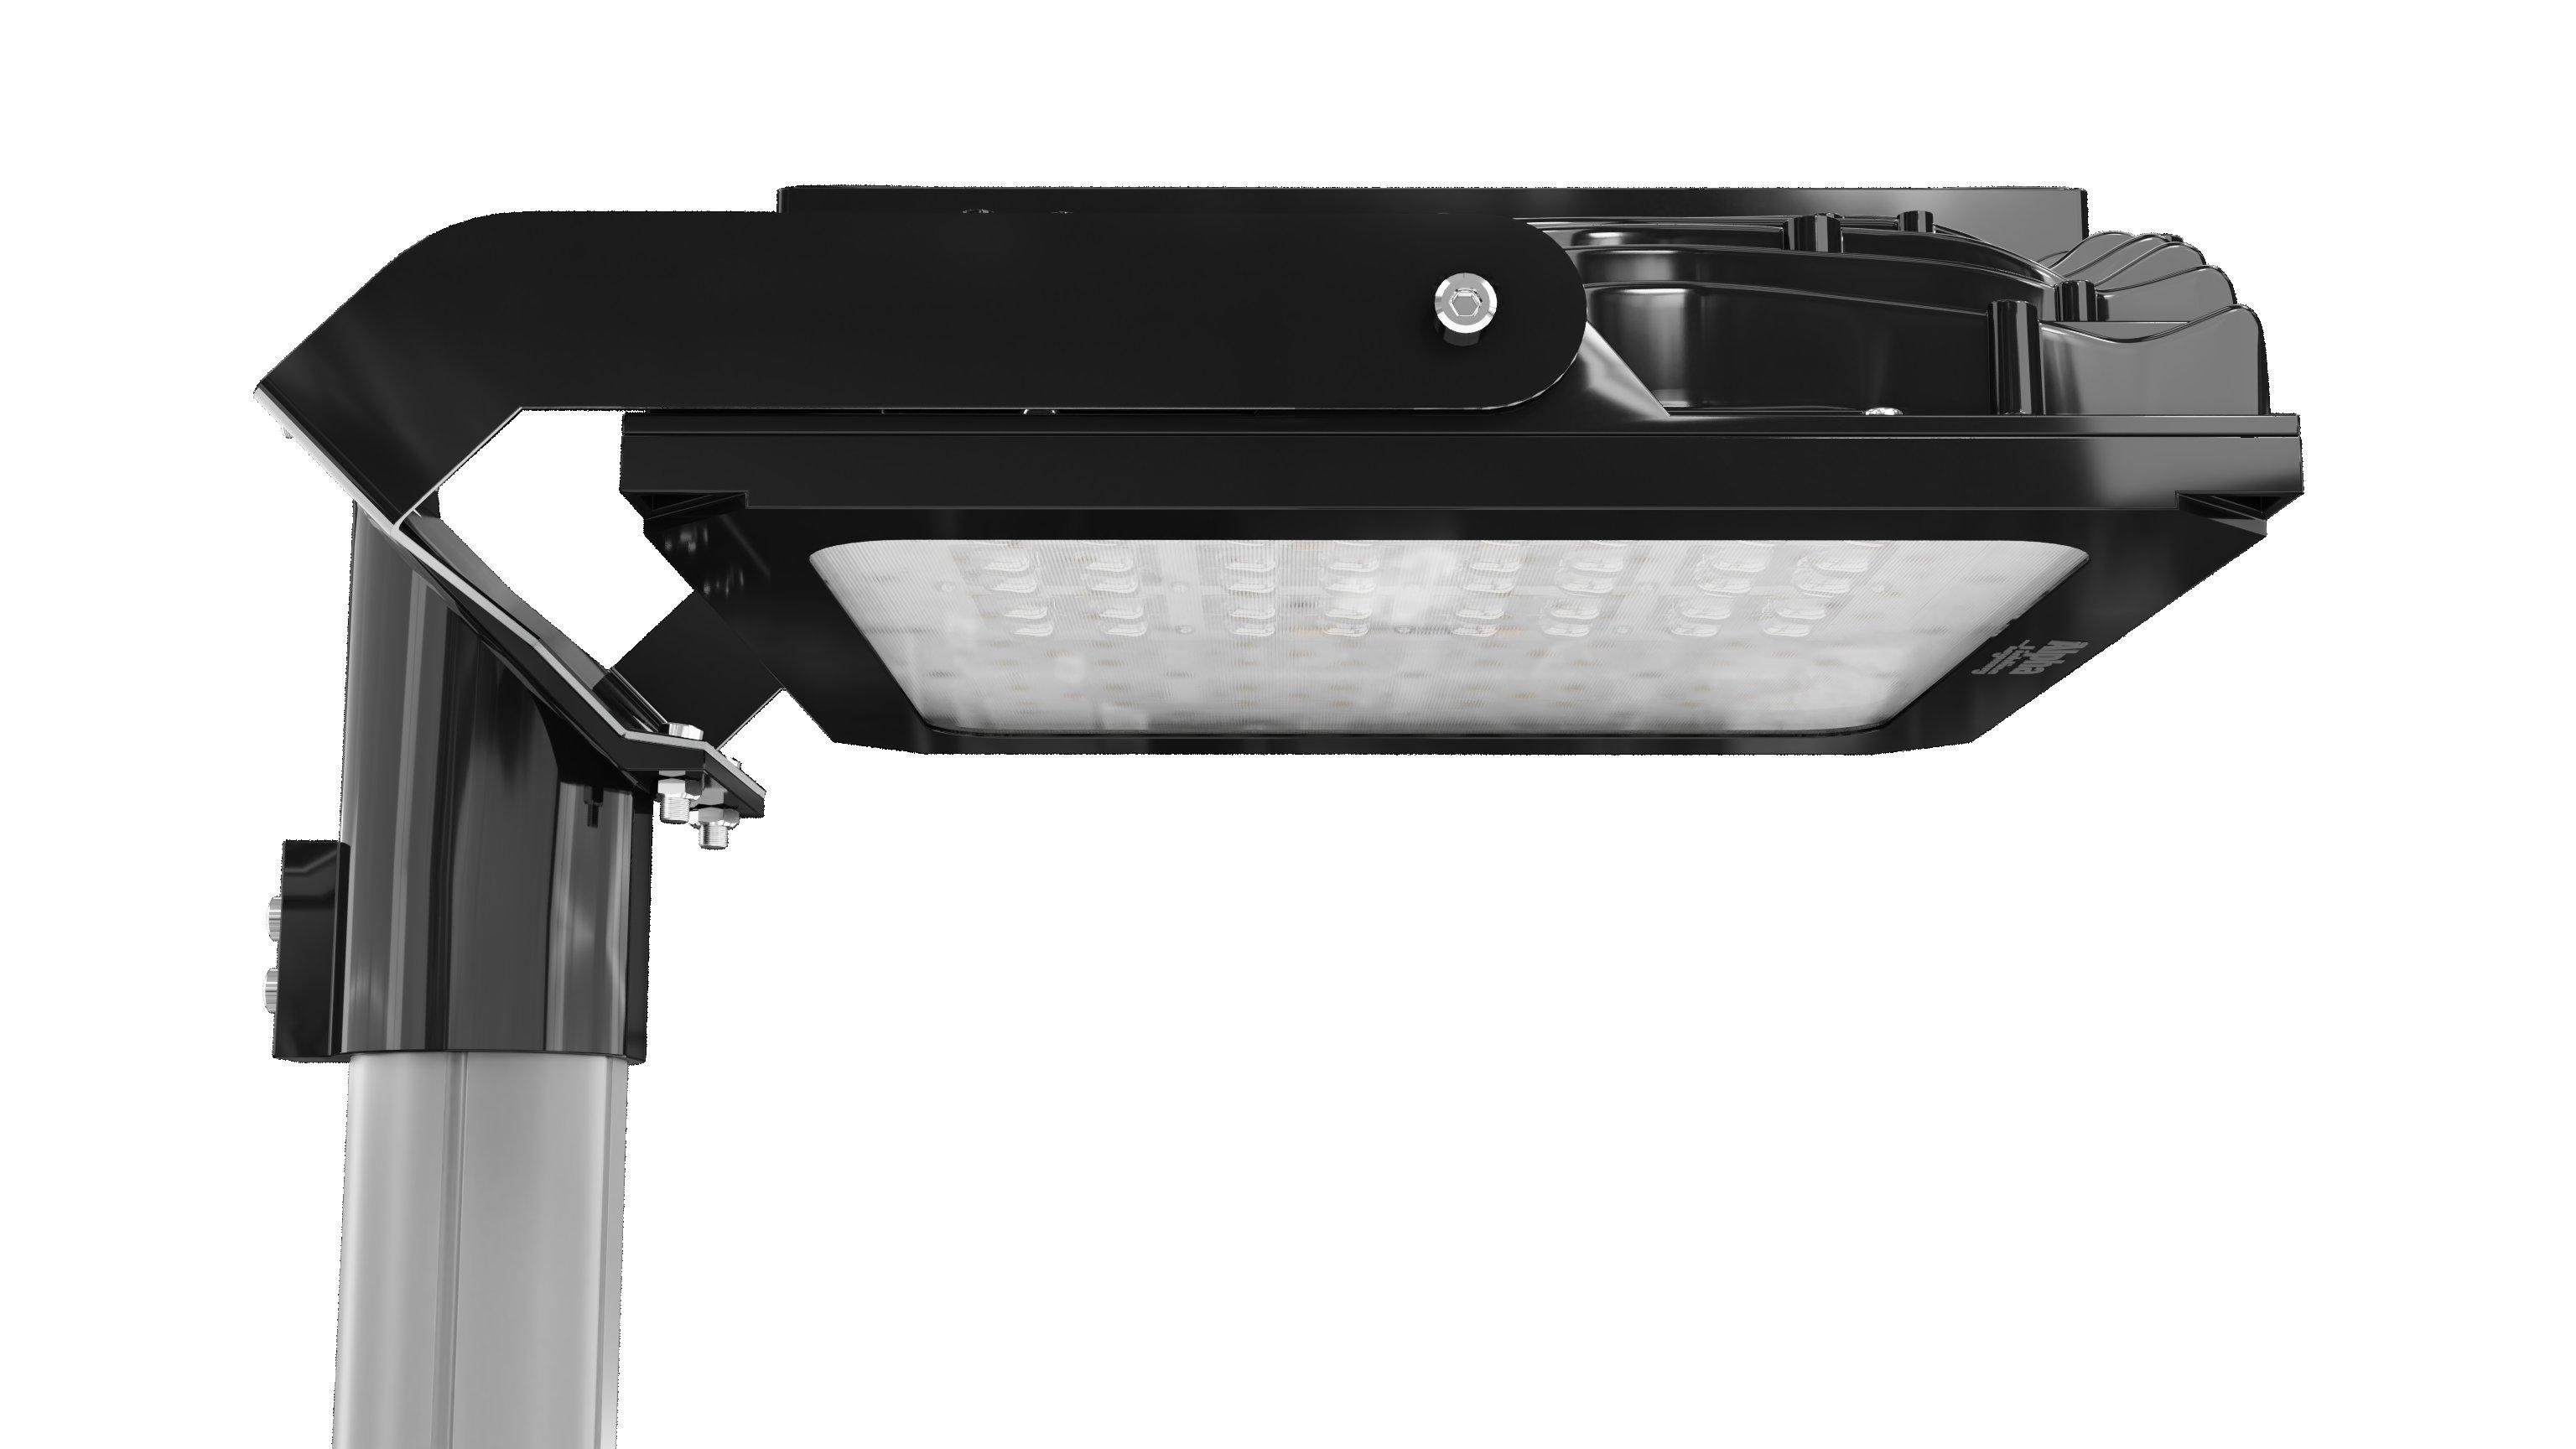 LED Projectors Vs LED Streetlights